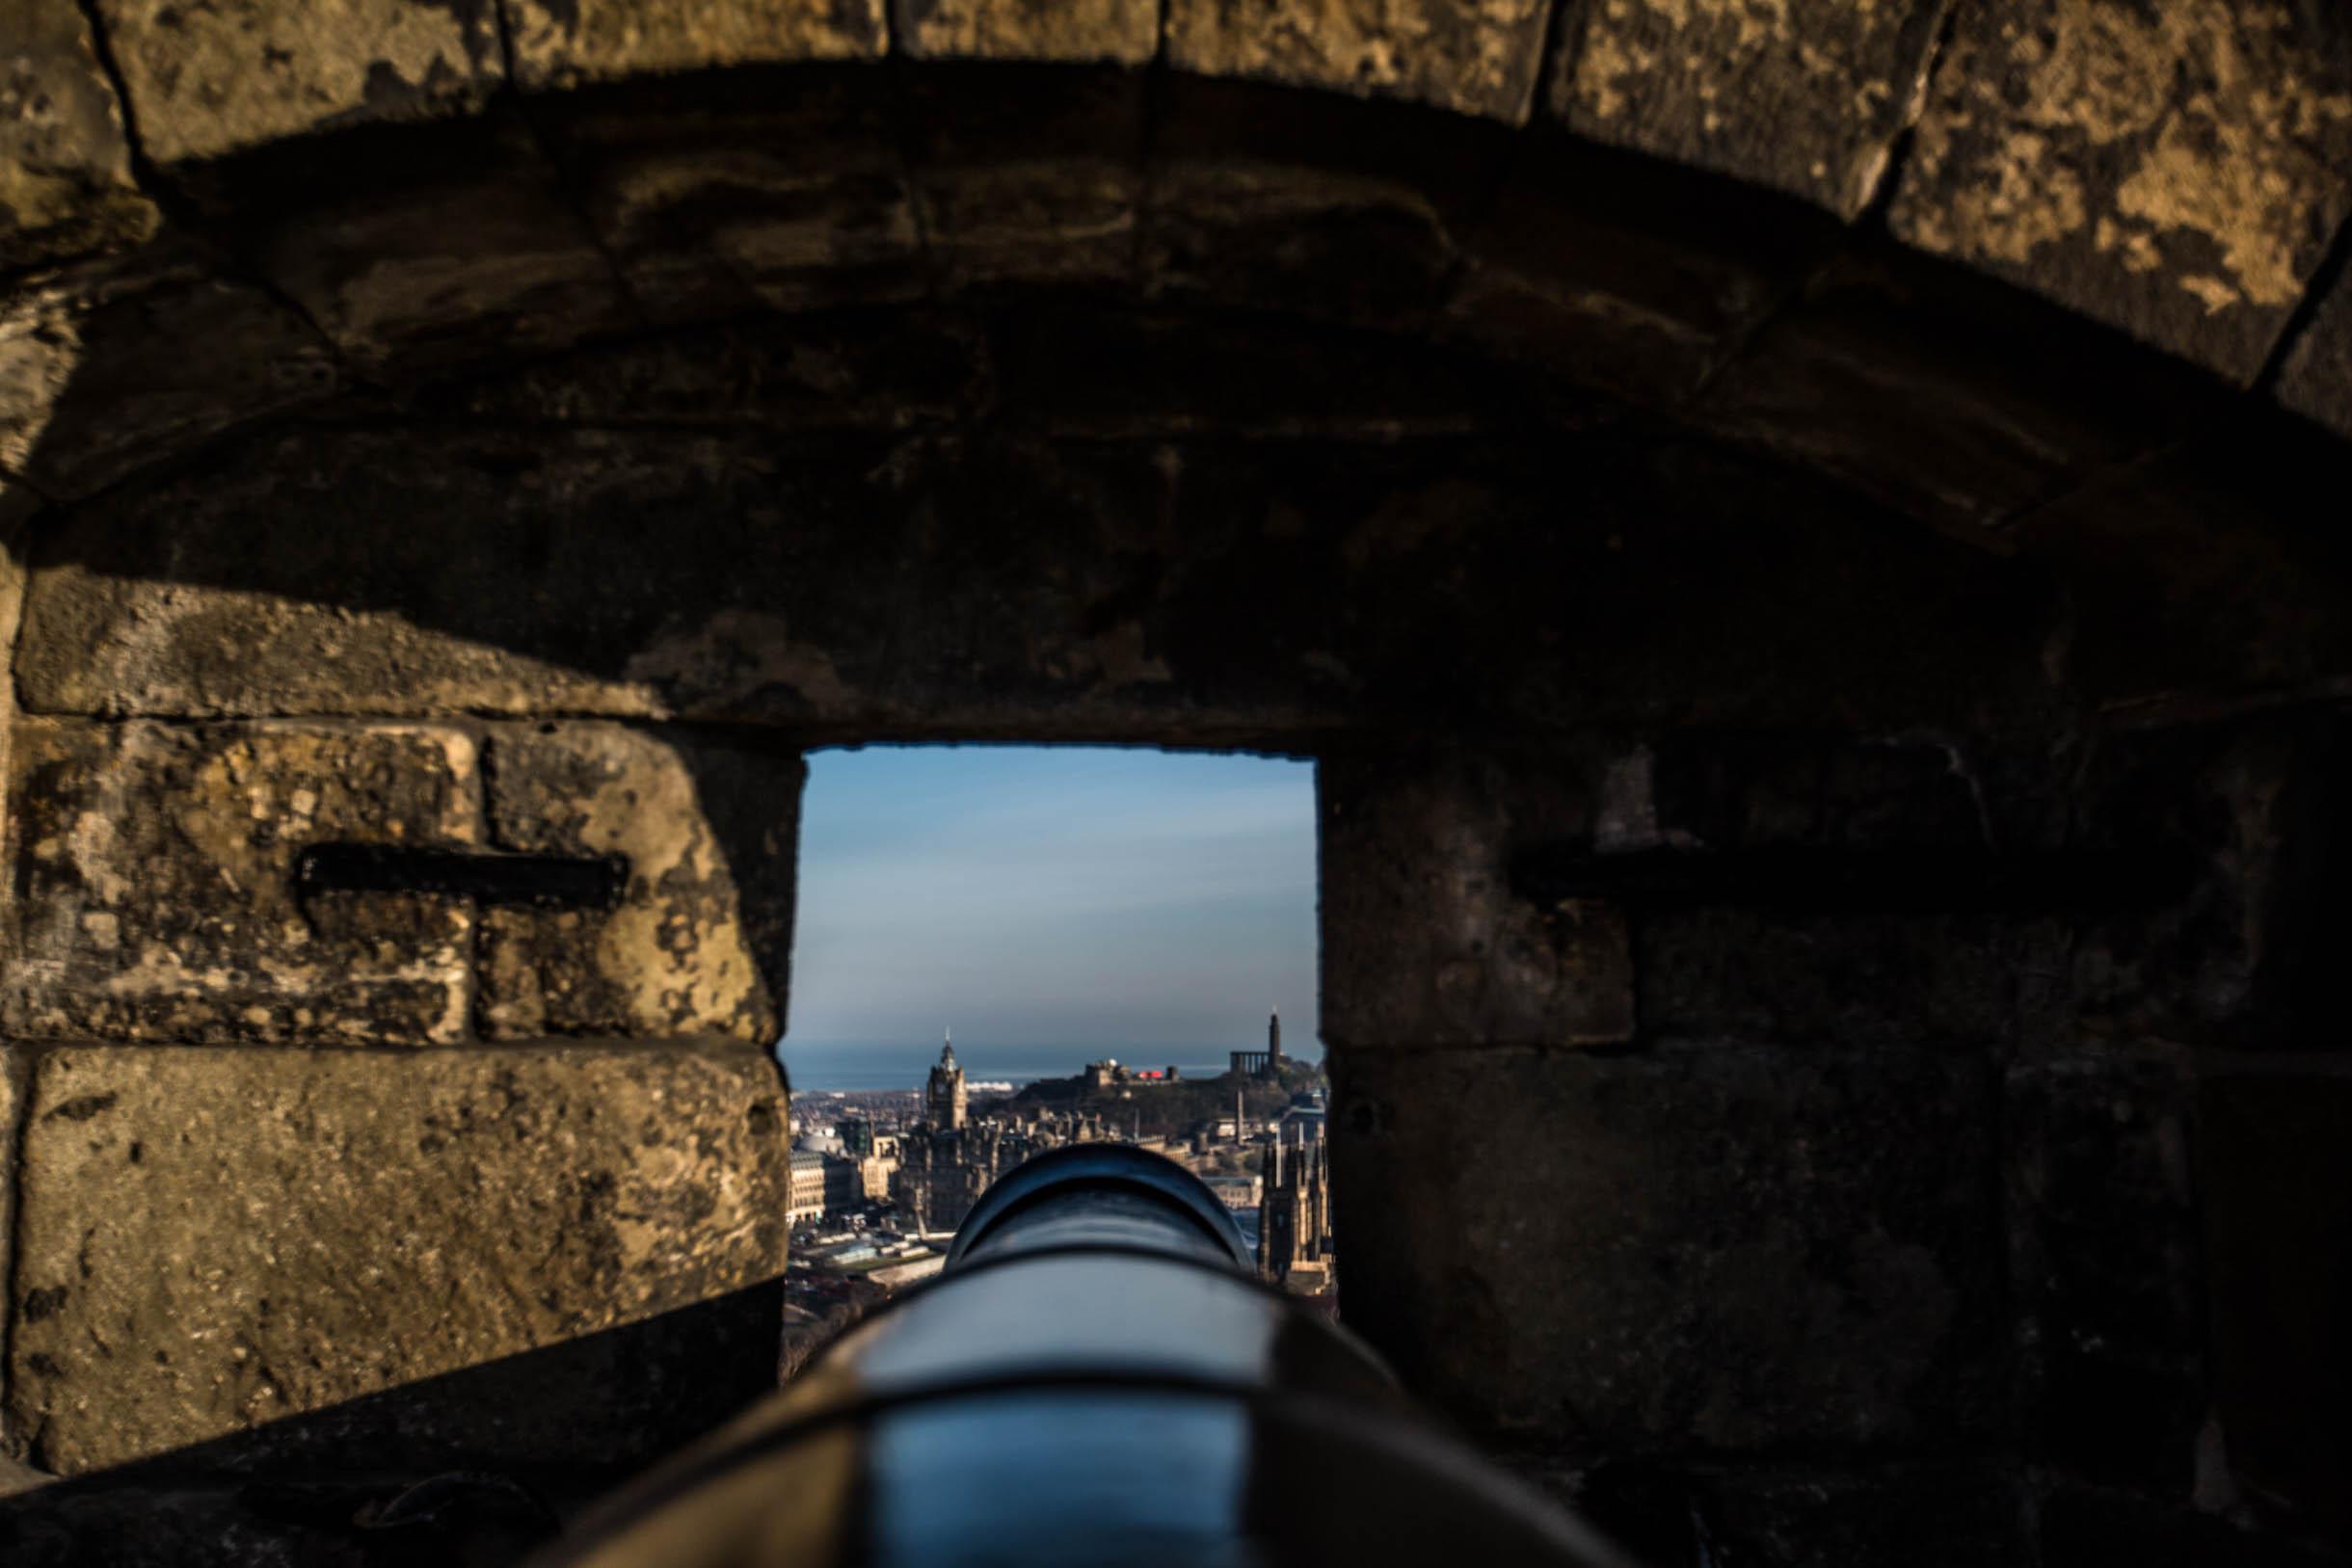 canon in edinburgh castle